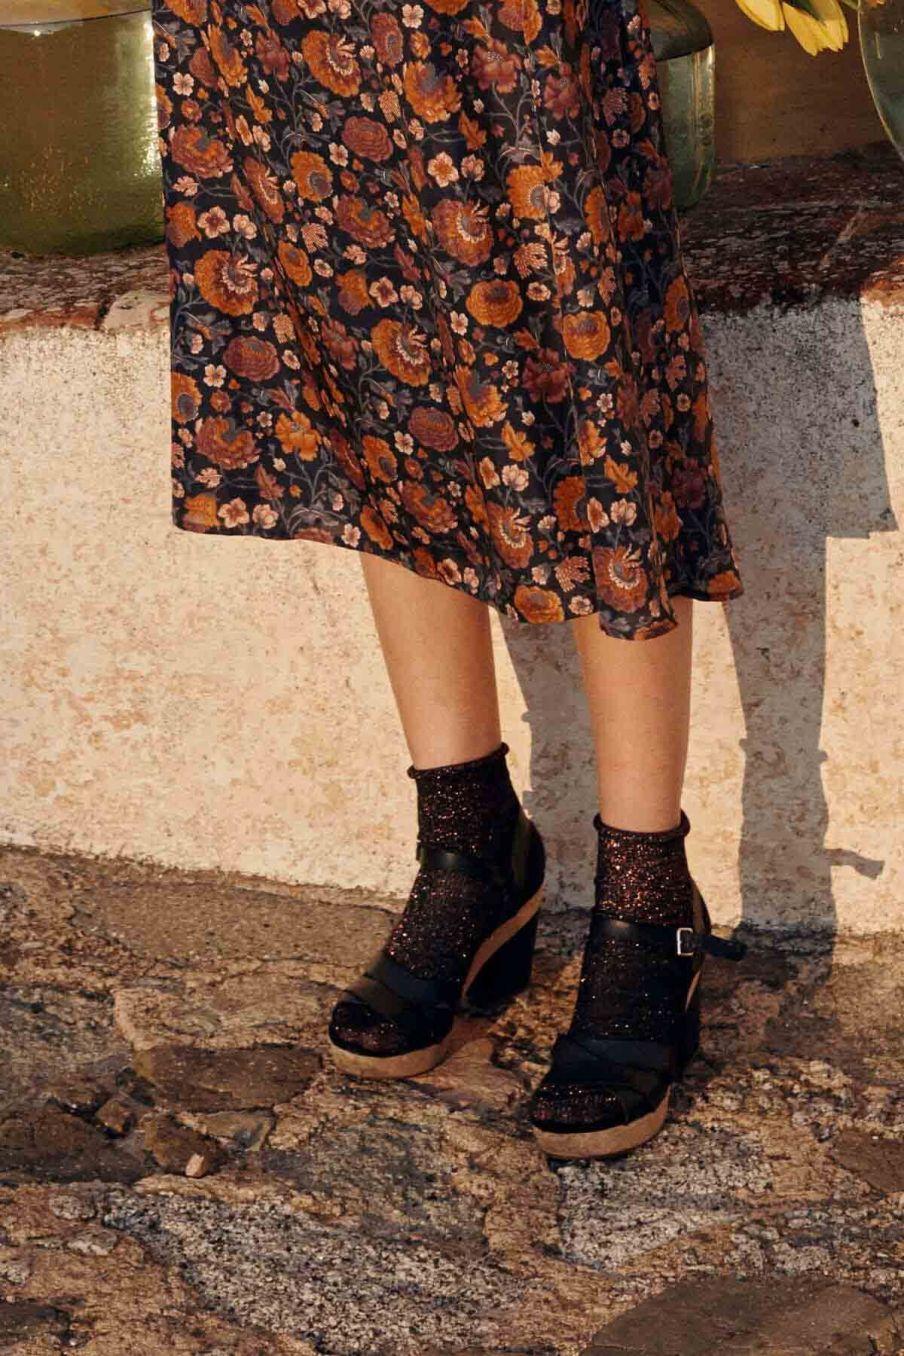 chaussettes femme louisiane midnight - louise misha